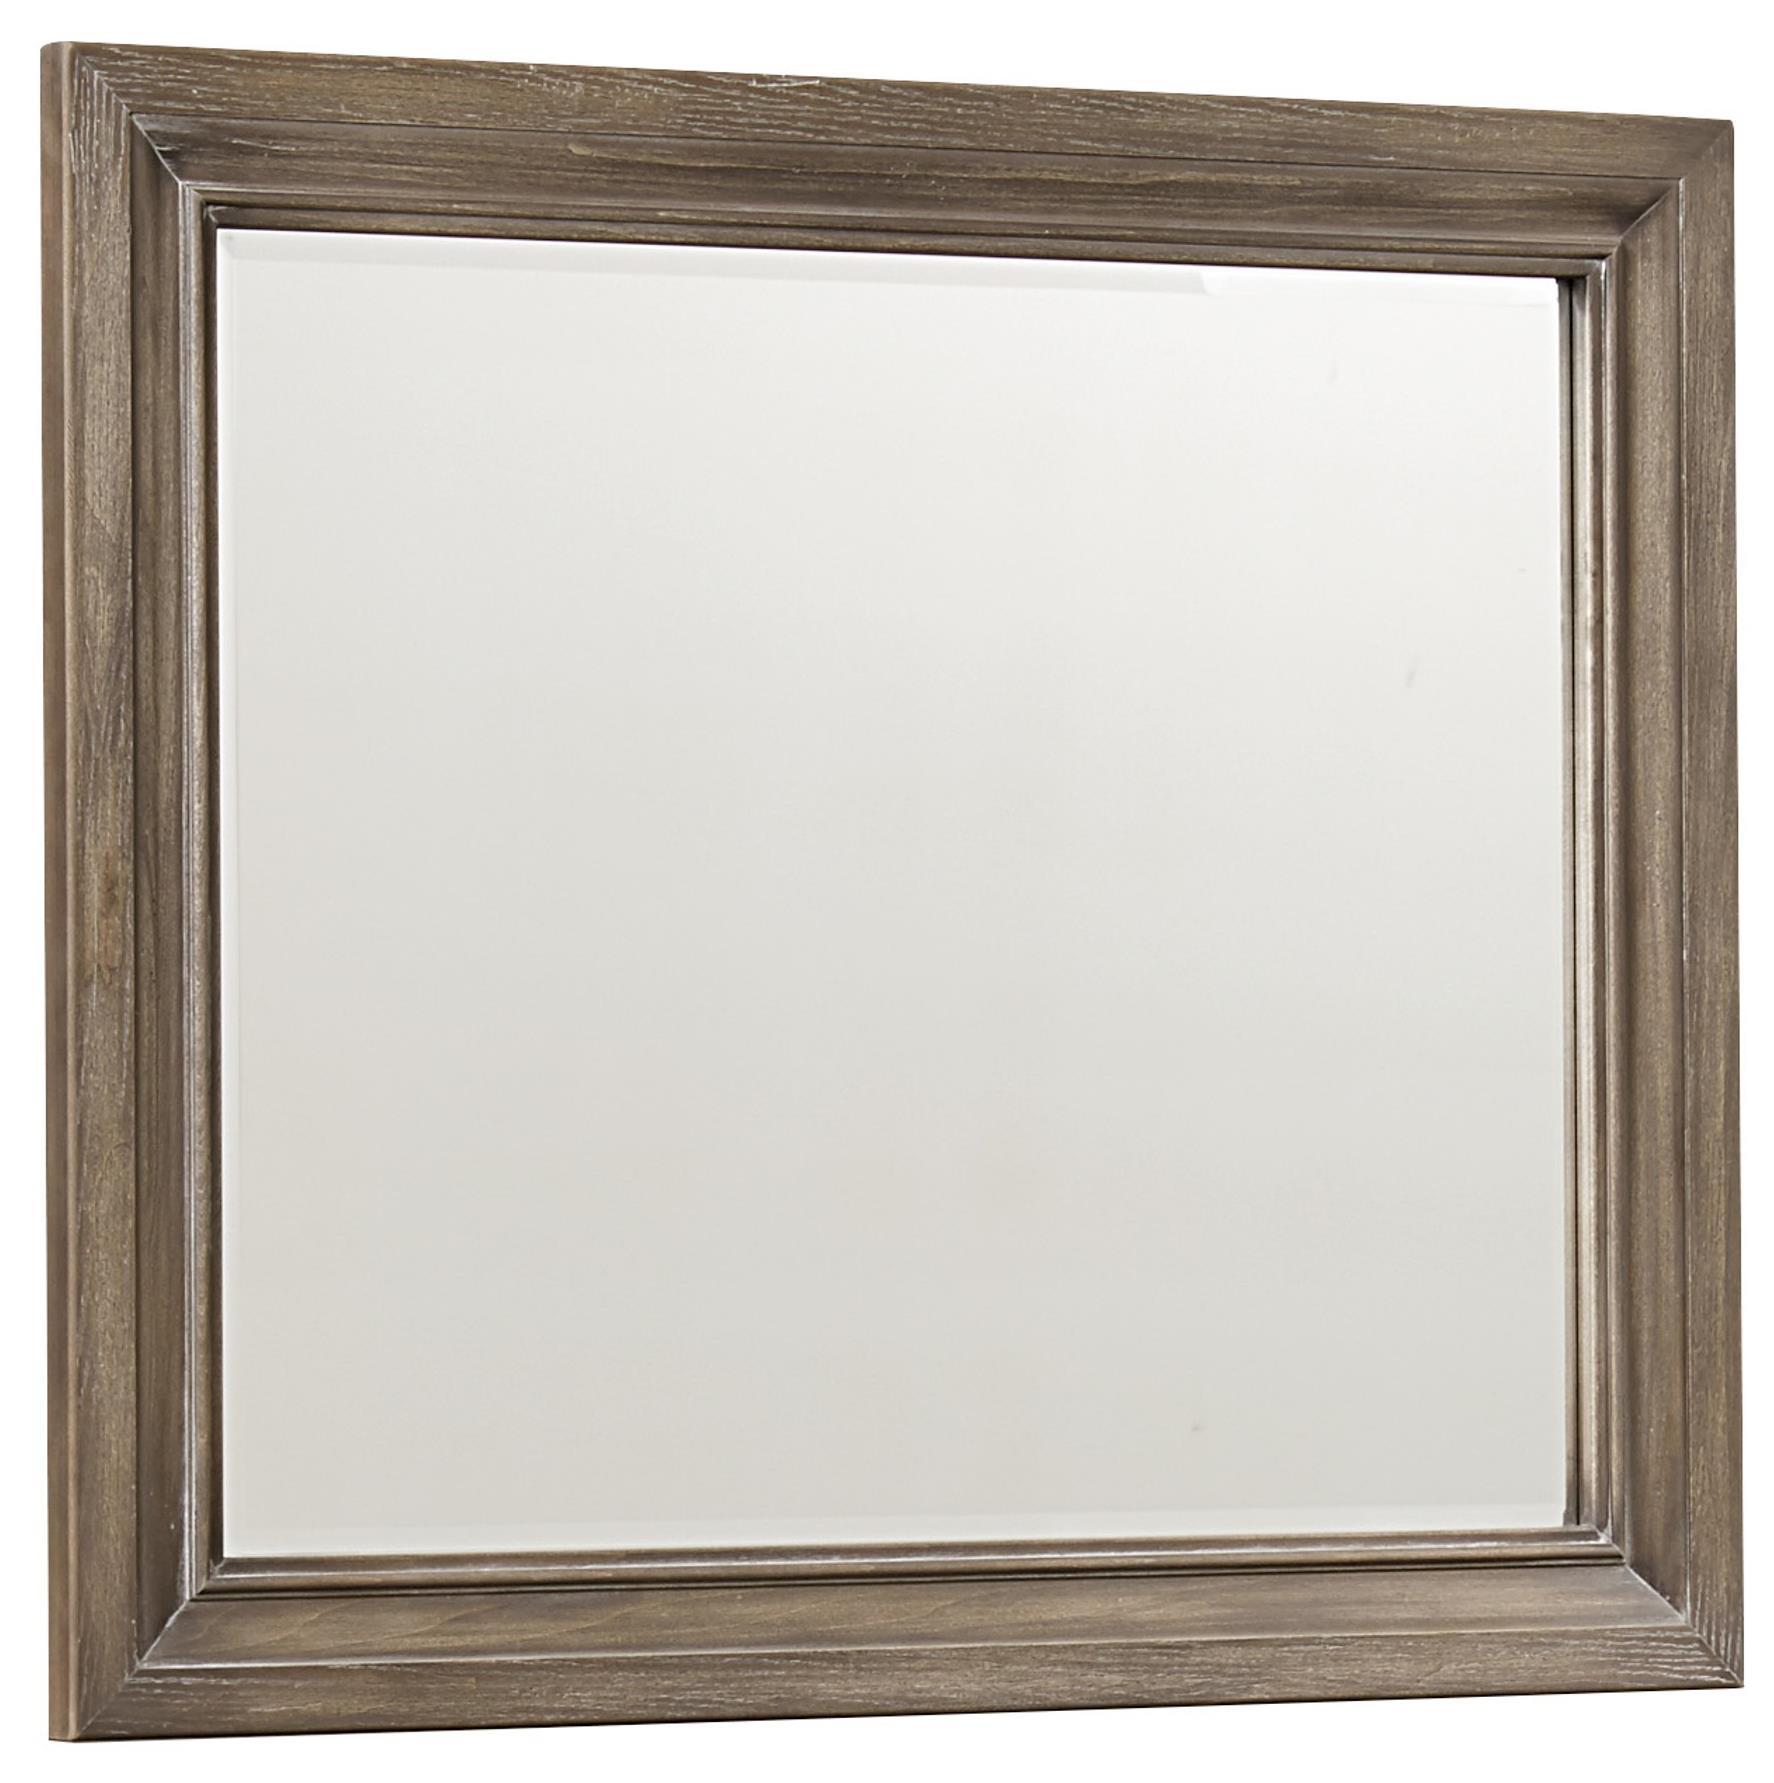 Vaughan Bassett Whiskey Barrel Landscape Mirror - Item Number: 814-446